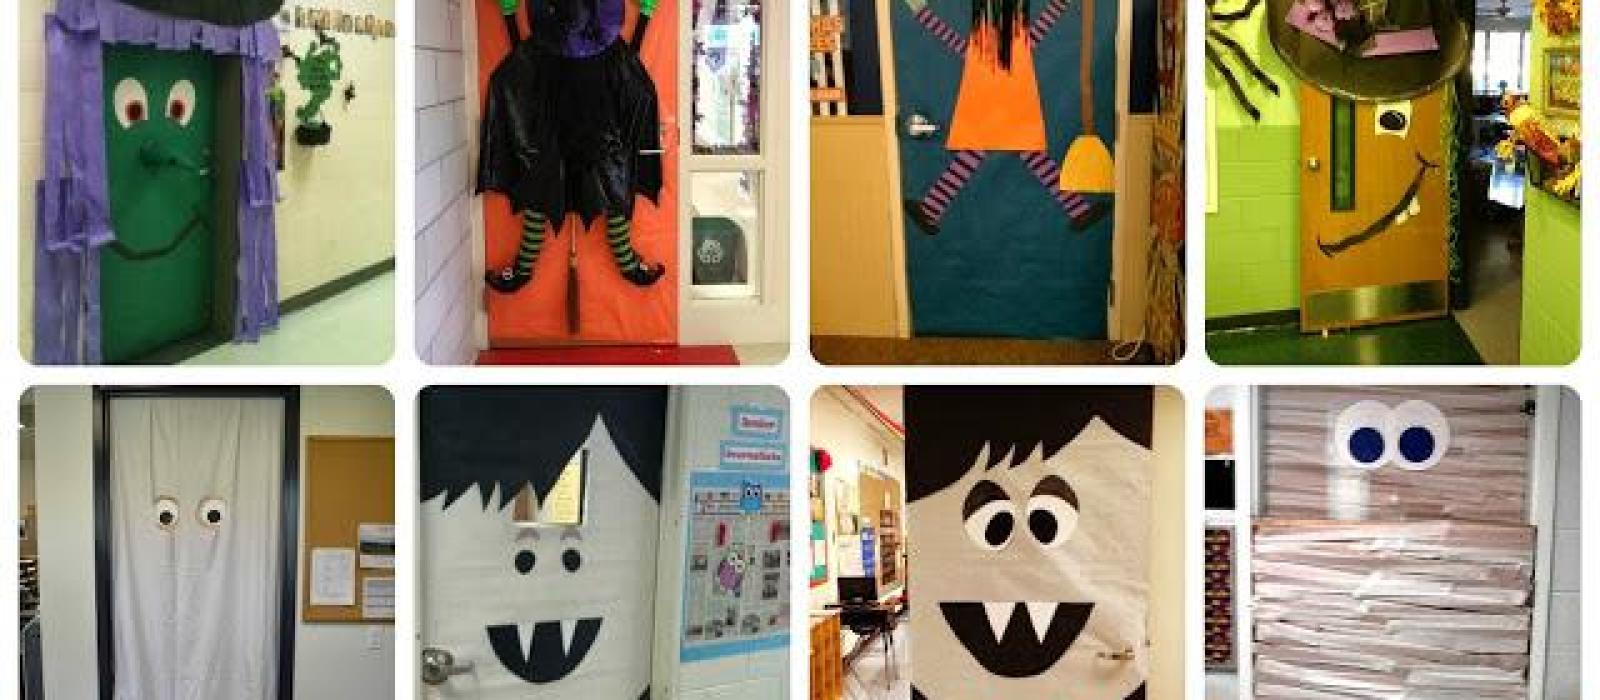 halloween puertas 16 imagenes educativas